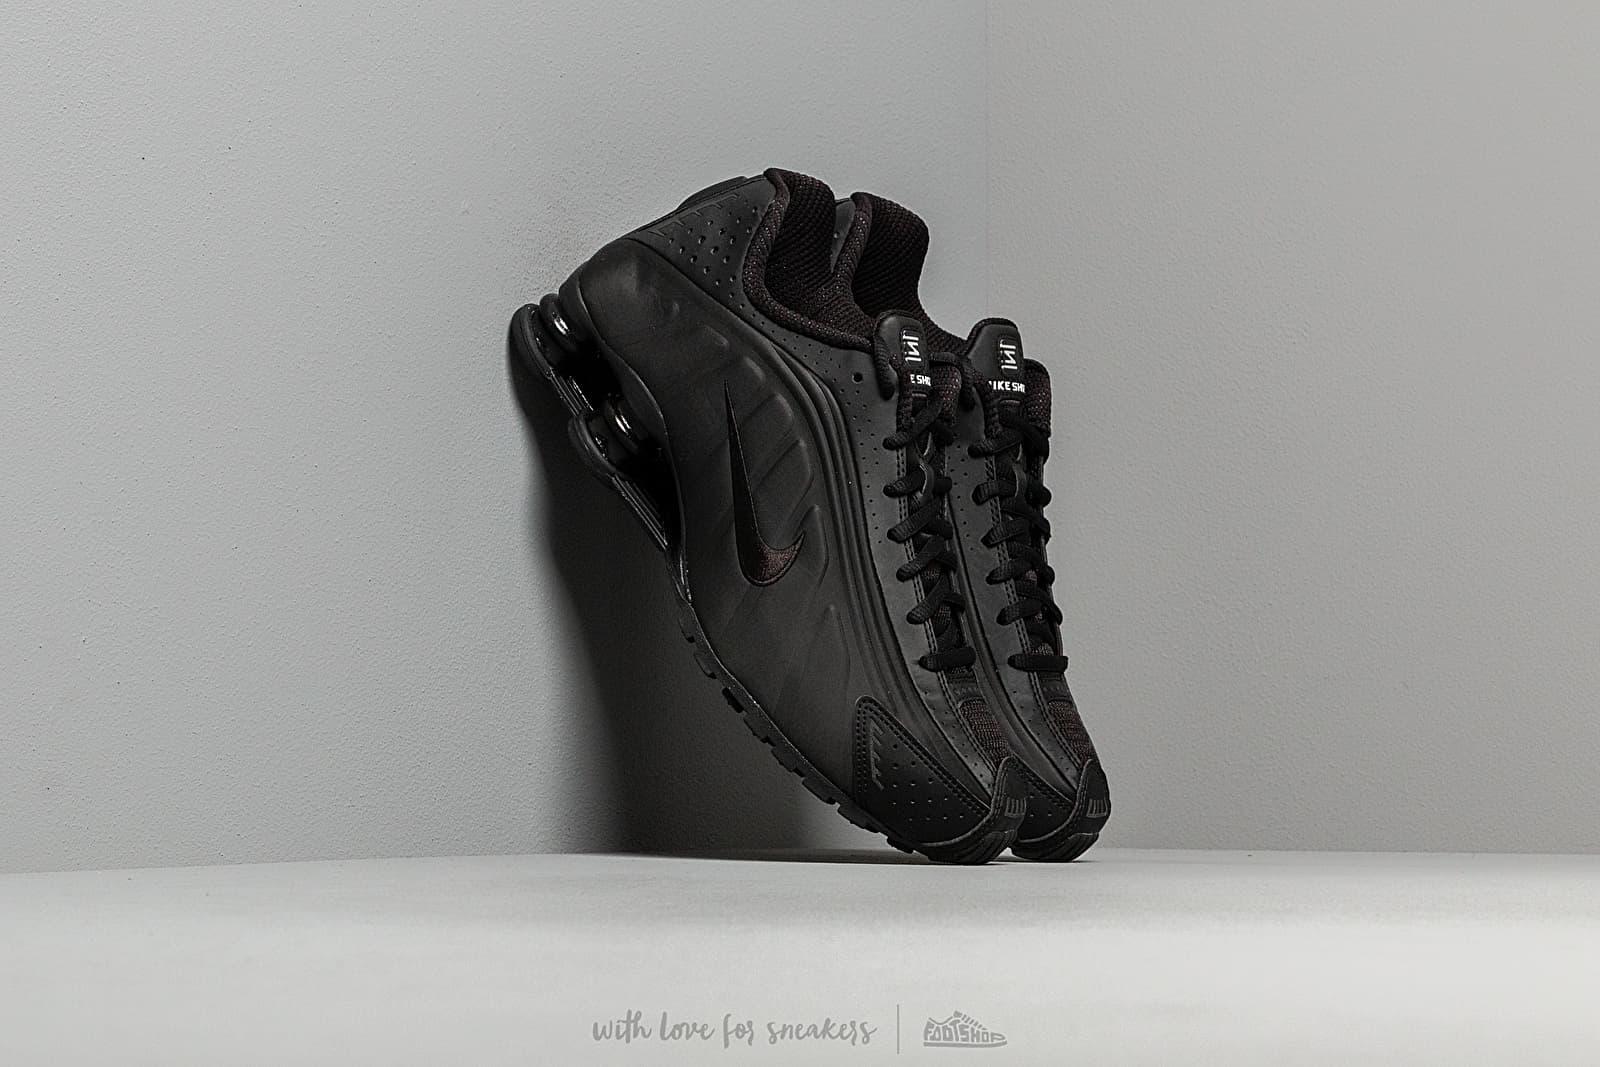 f11b4f98b5 Nike Shox R4 Black/ Black-Black-White at a great price £121